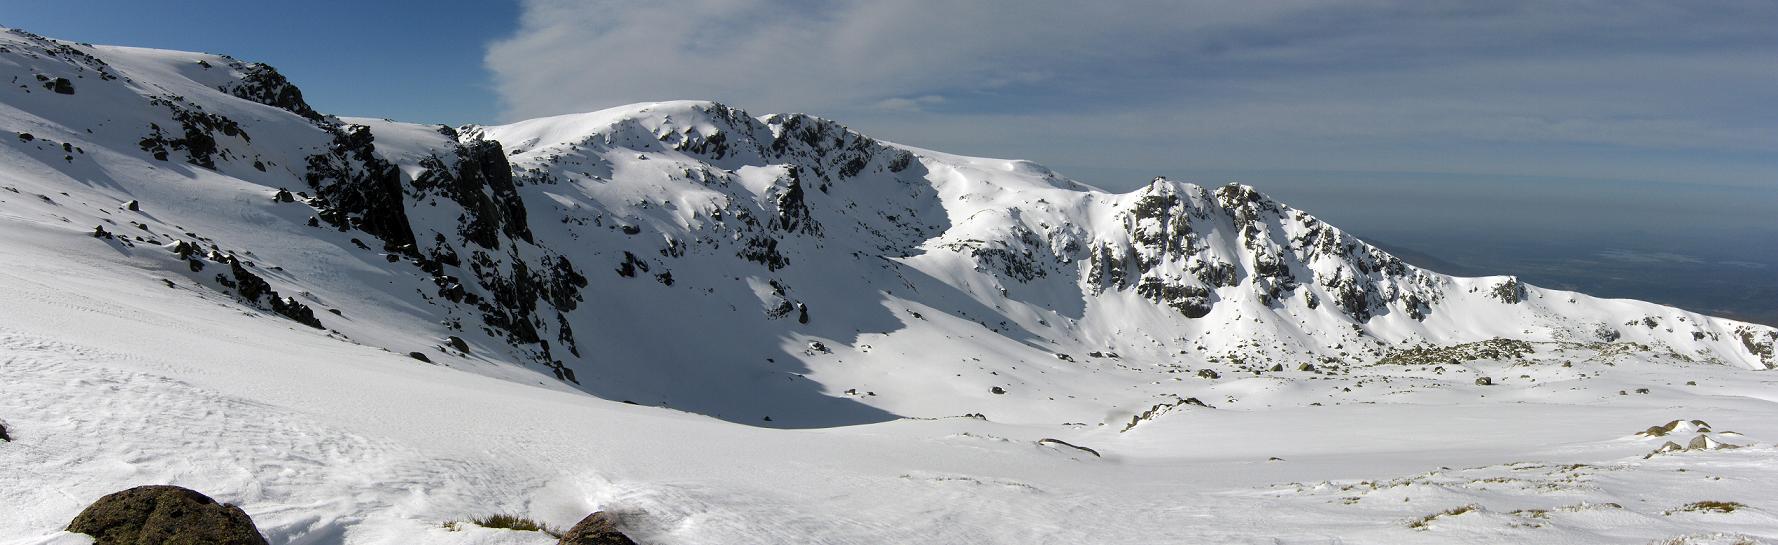 Sierra de Béjar 3, Sierra de Béjar - La Covatilla